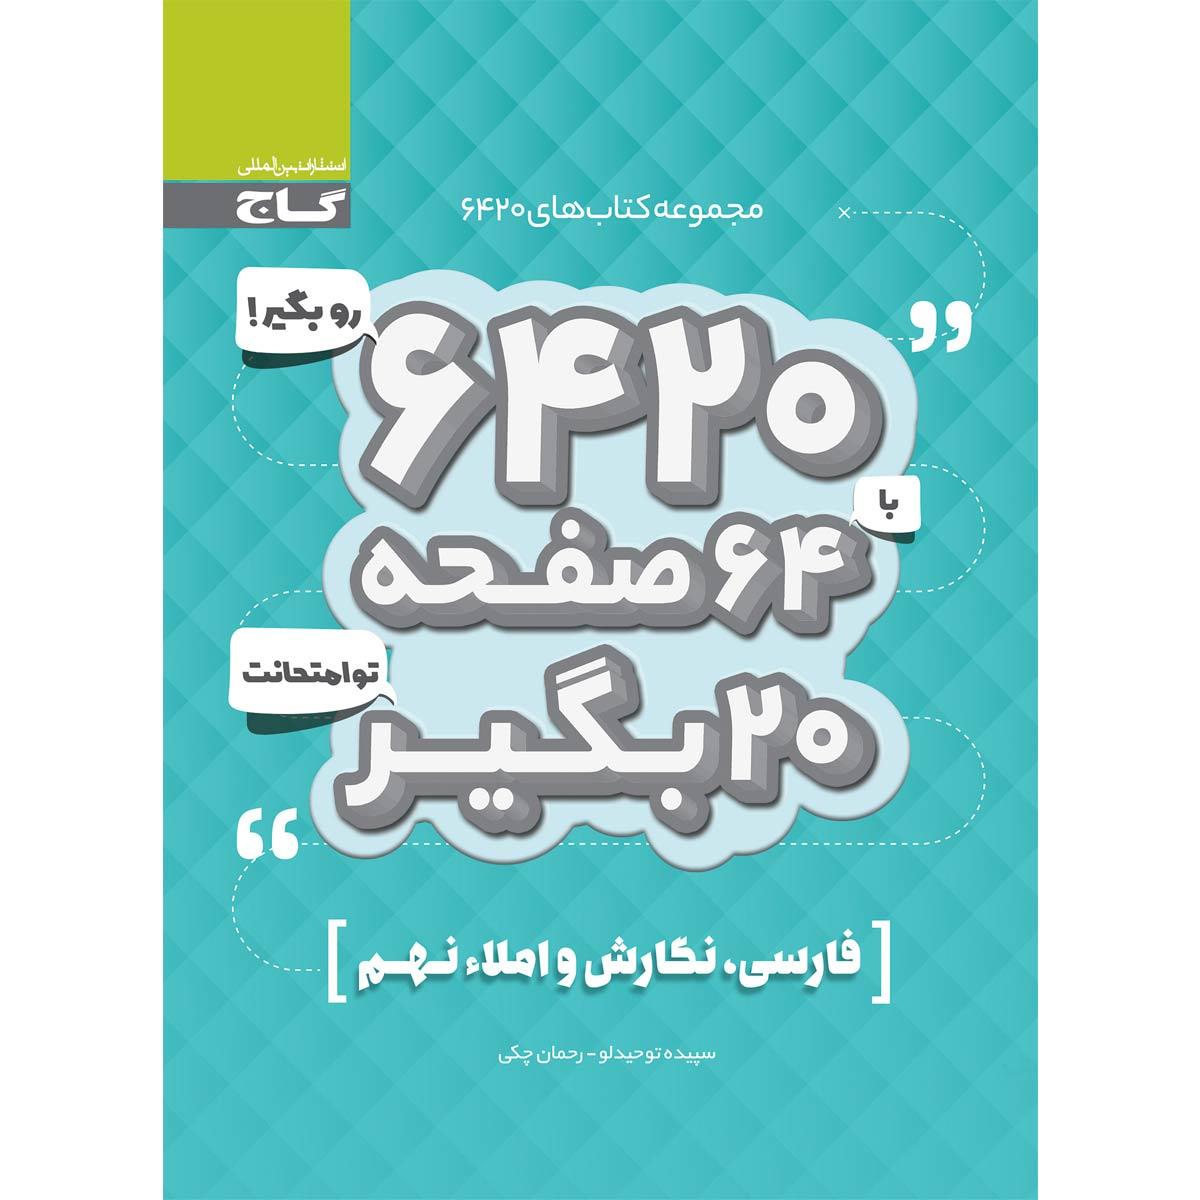 کتاب فارسی نگارش و املا نهم سری 6420 انتشارات بین المللی گاج